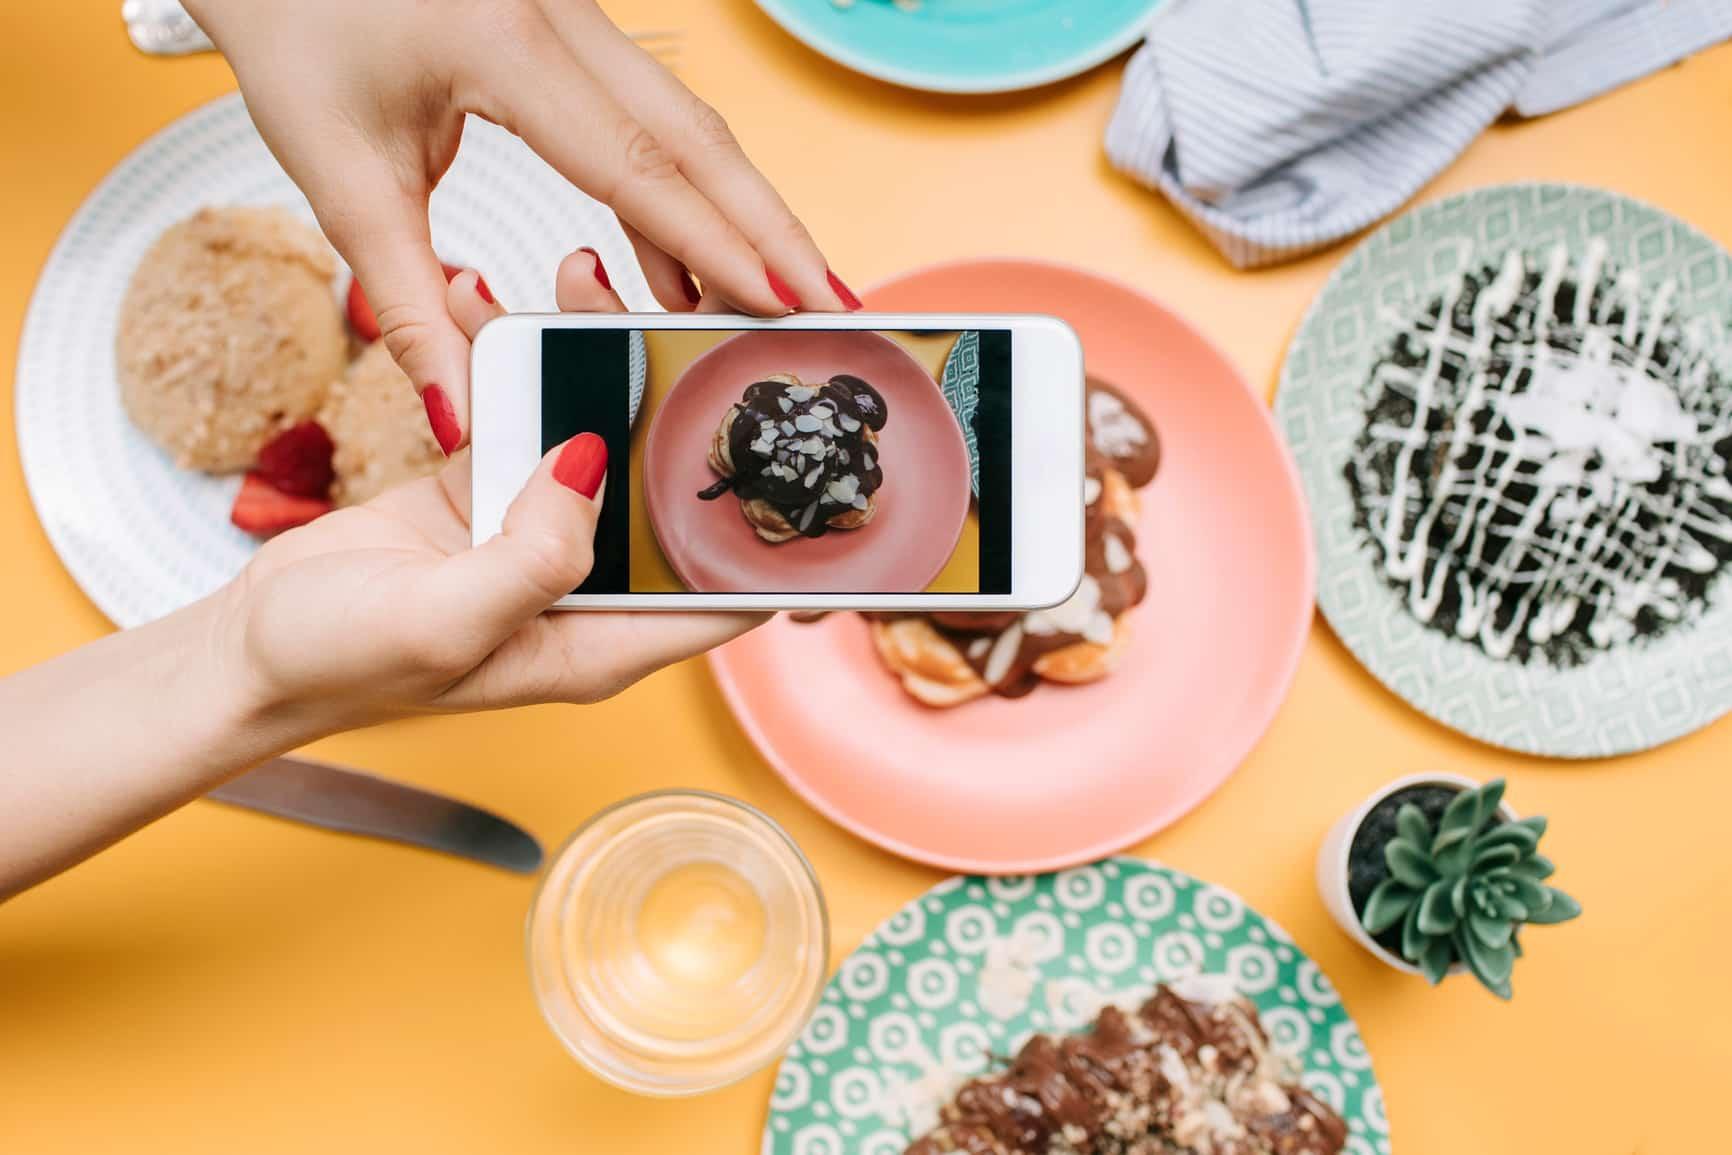 Agence Communication Food experte dans le Social Media et Brand content